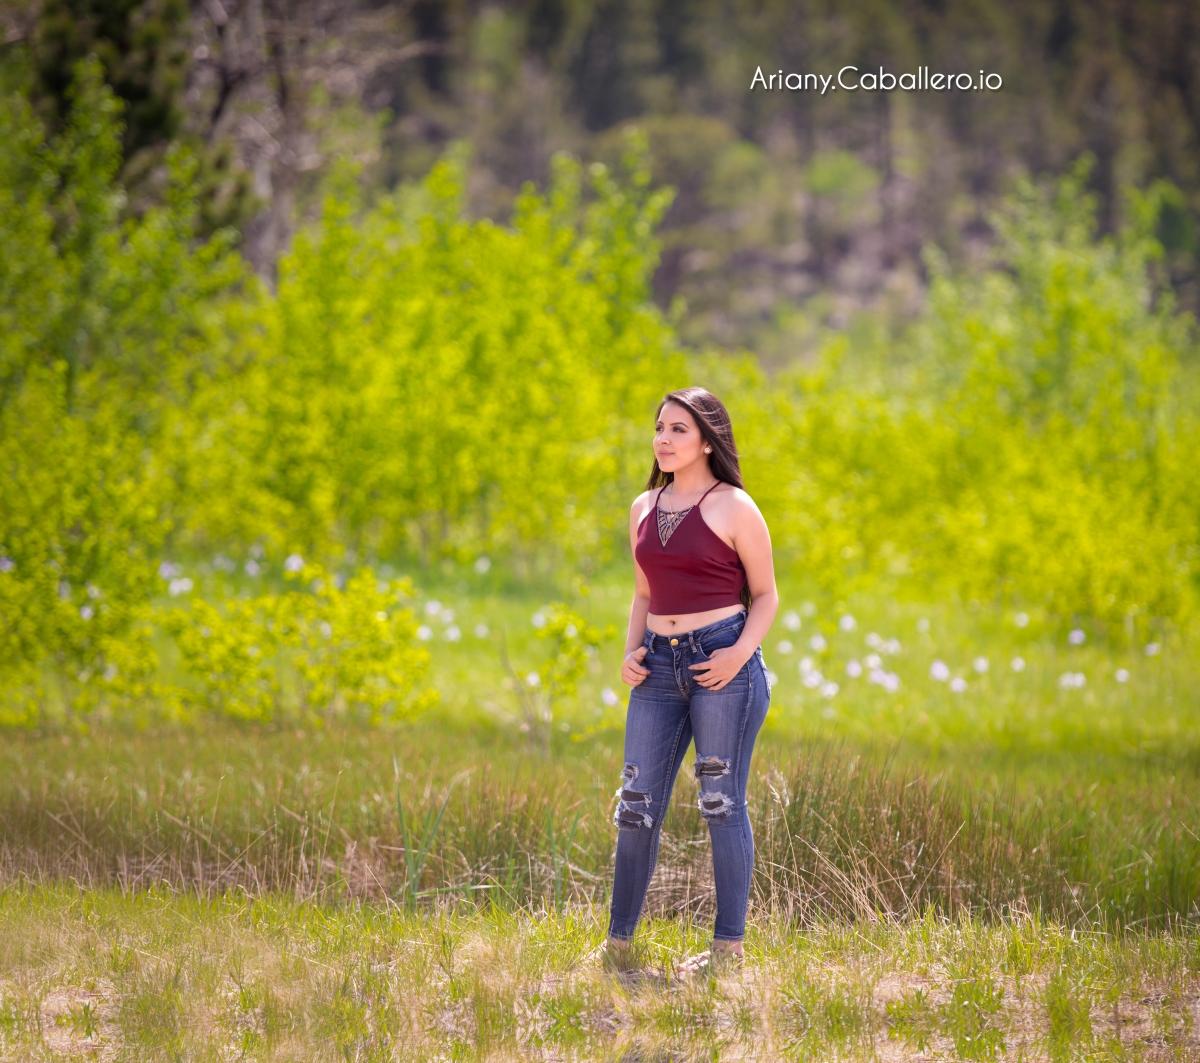 Ariany Sesion Casual de XV (Quinceanera) Jesse Caballero | Fotografos en Denver